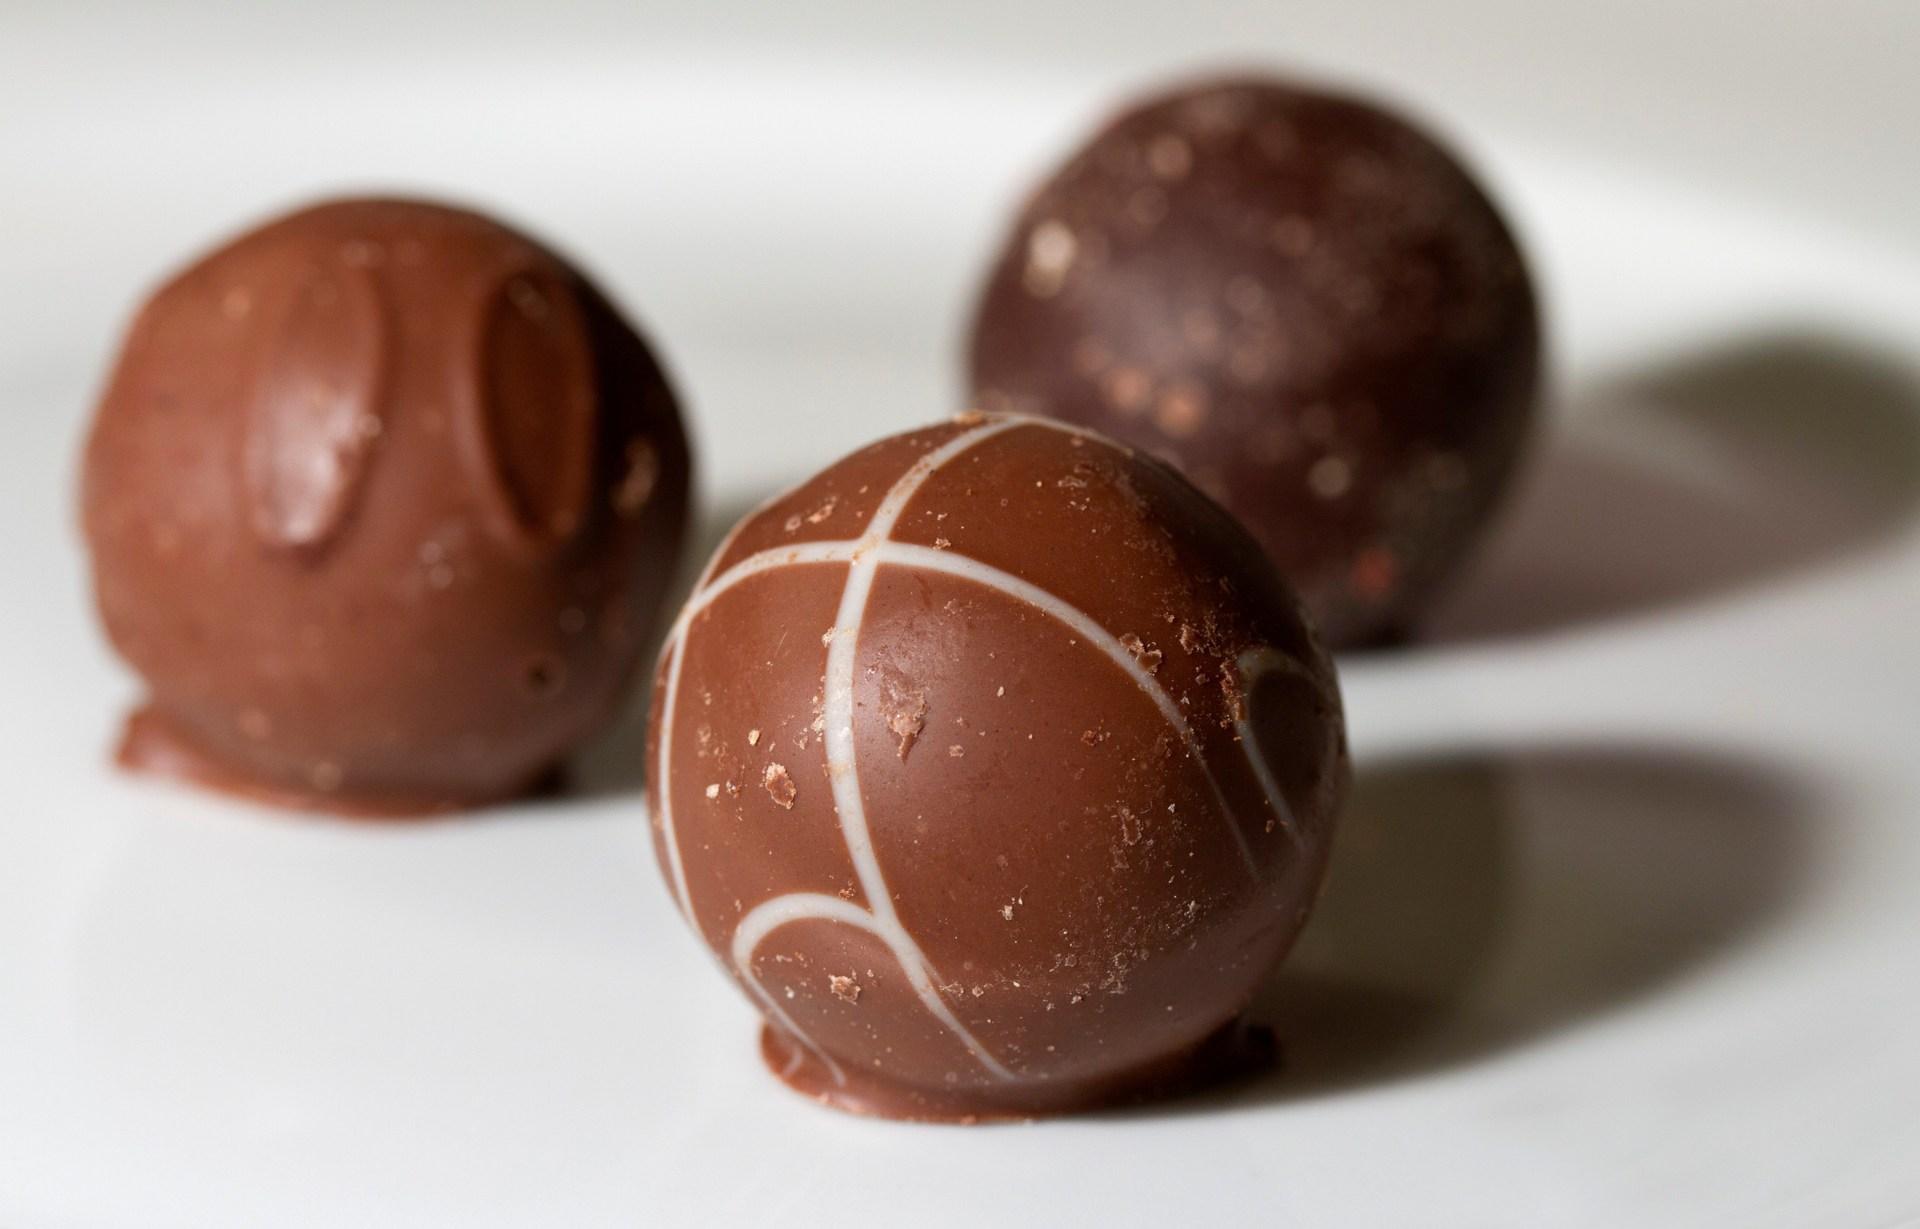 hinh nen chocolate 2